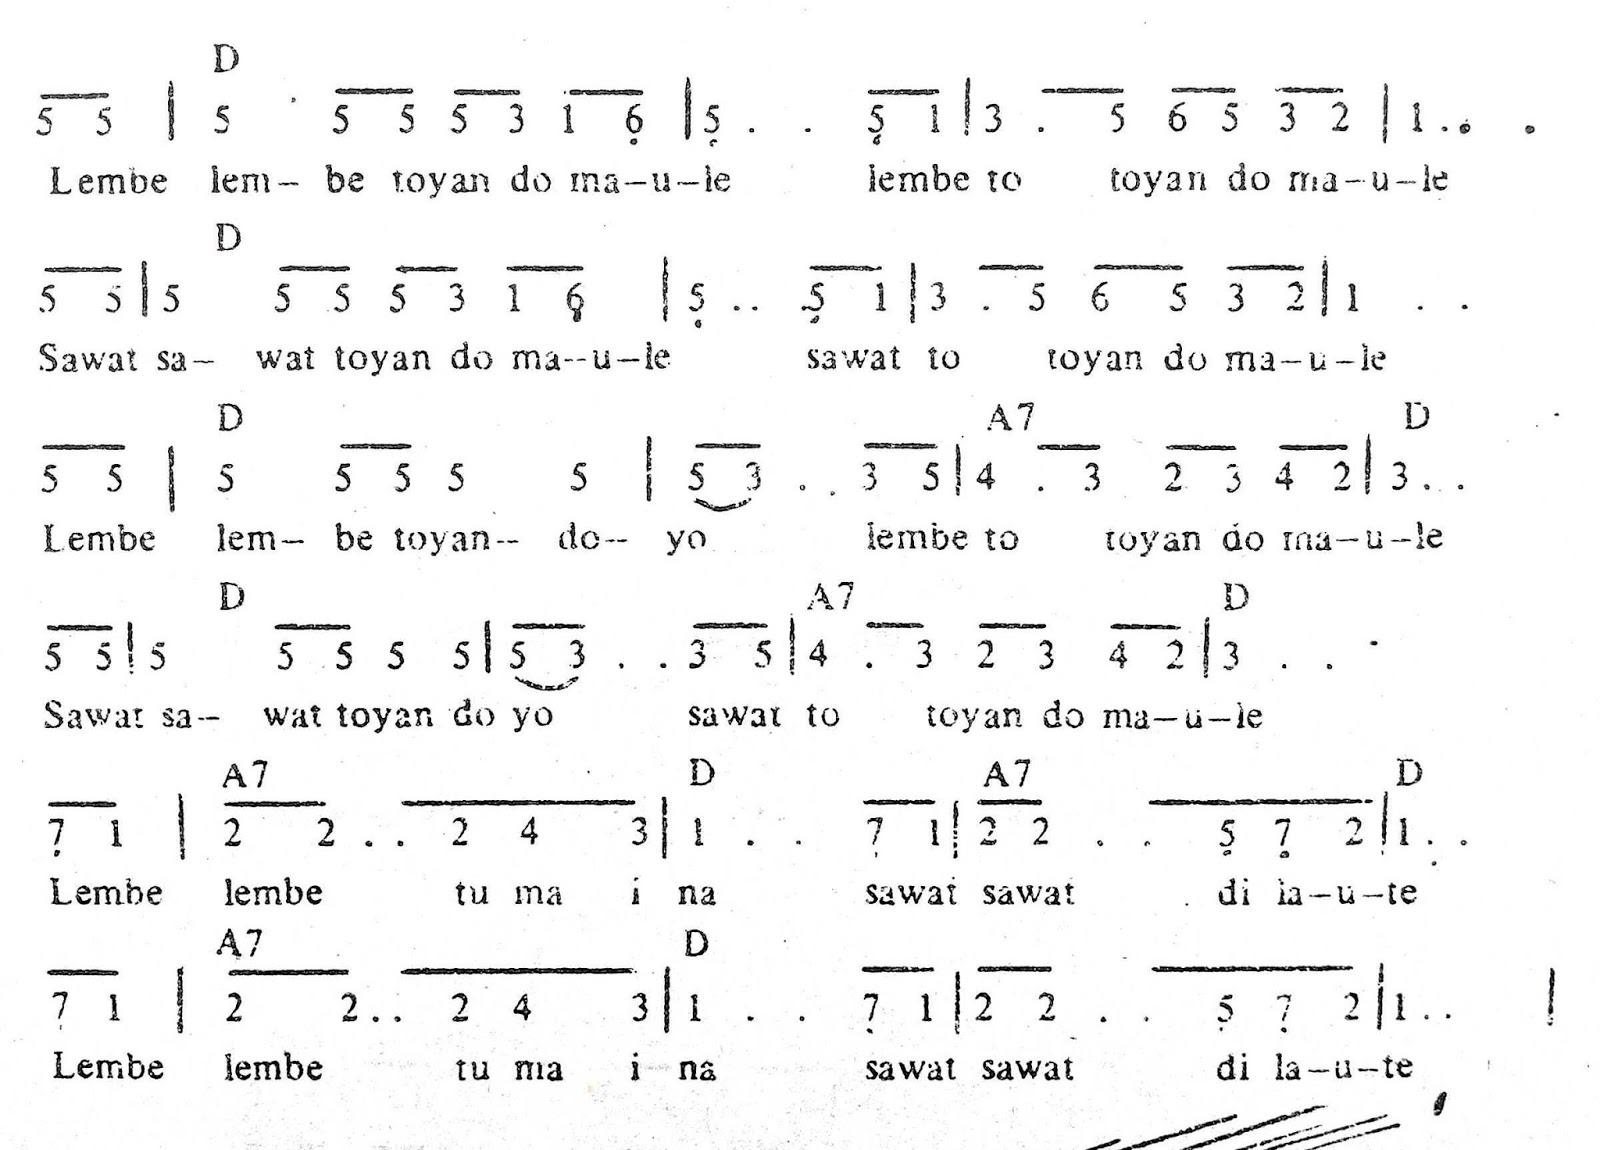 Chord & Arti Lirik Lagu Maluku: Lembe Lembe + Not Angka